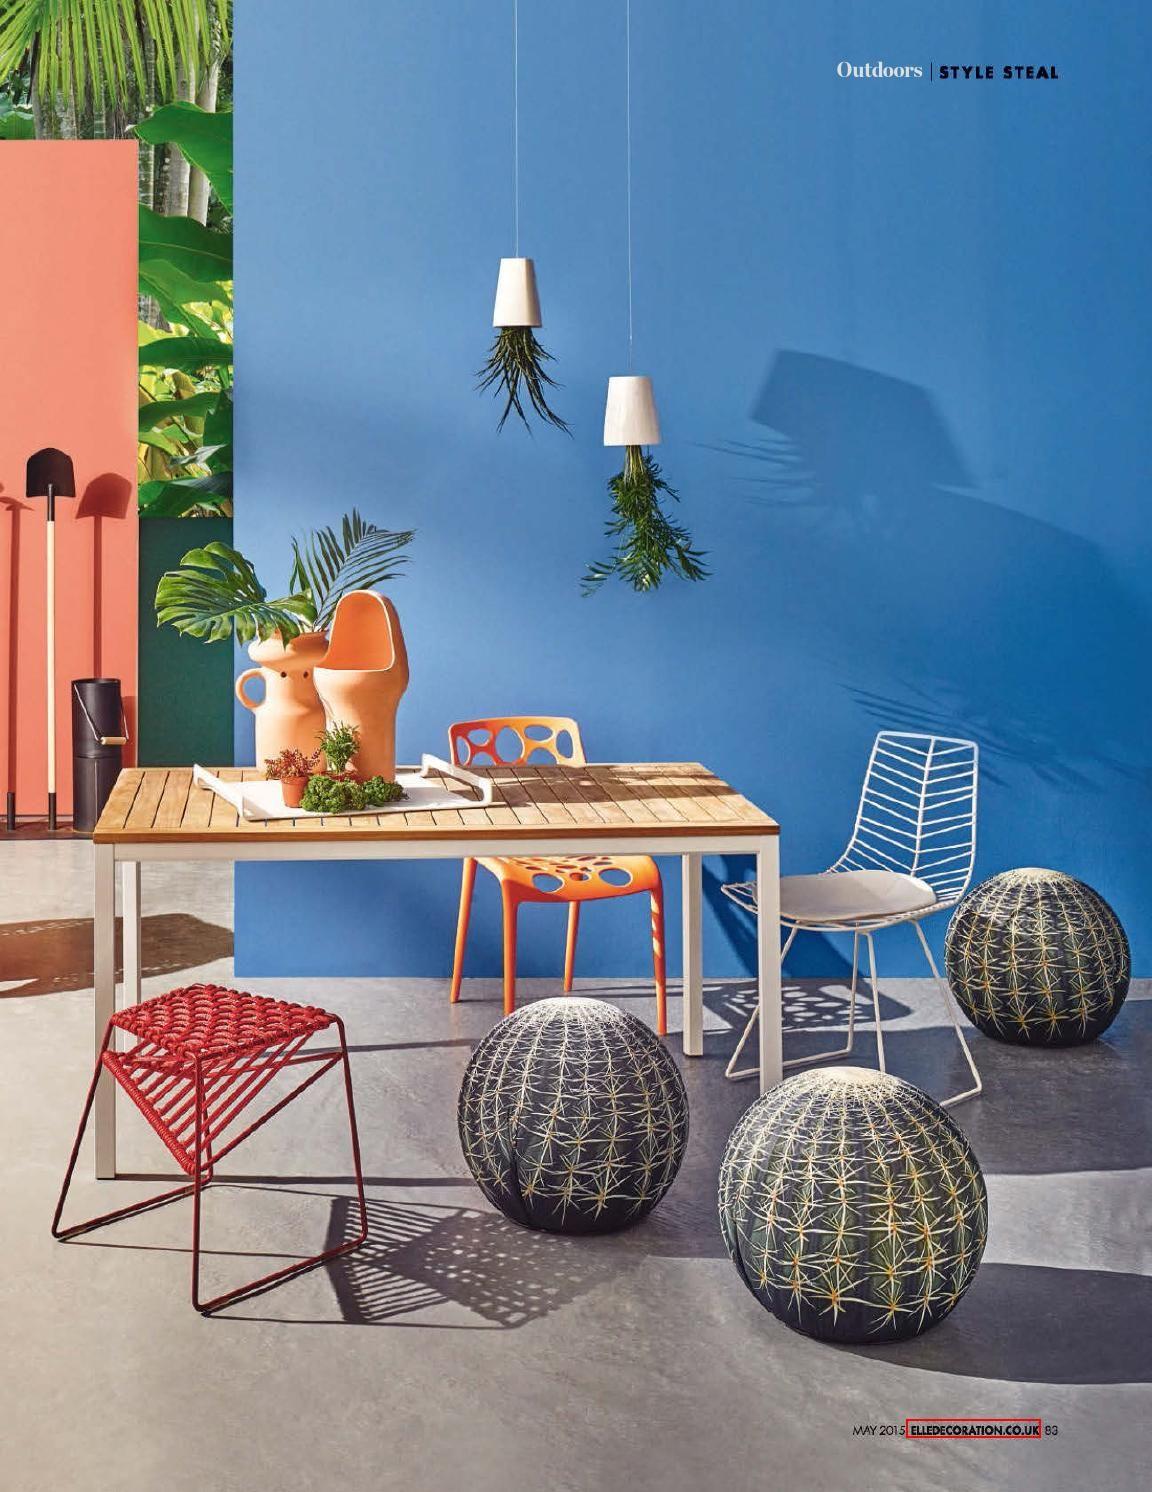 Elle decoration may 2015 uk Elle decor, Decor, Outdoor